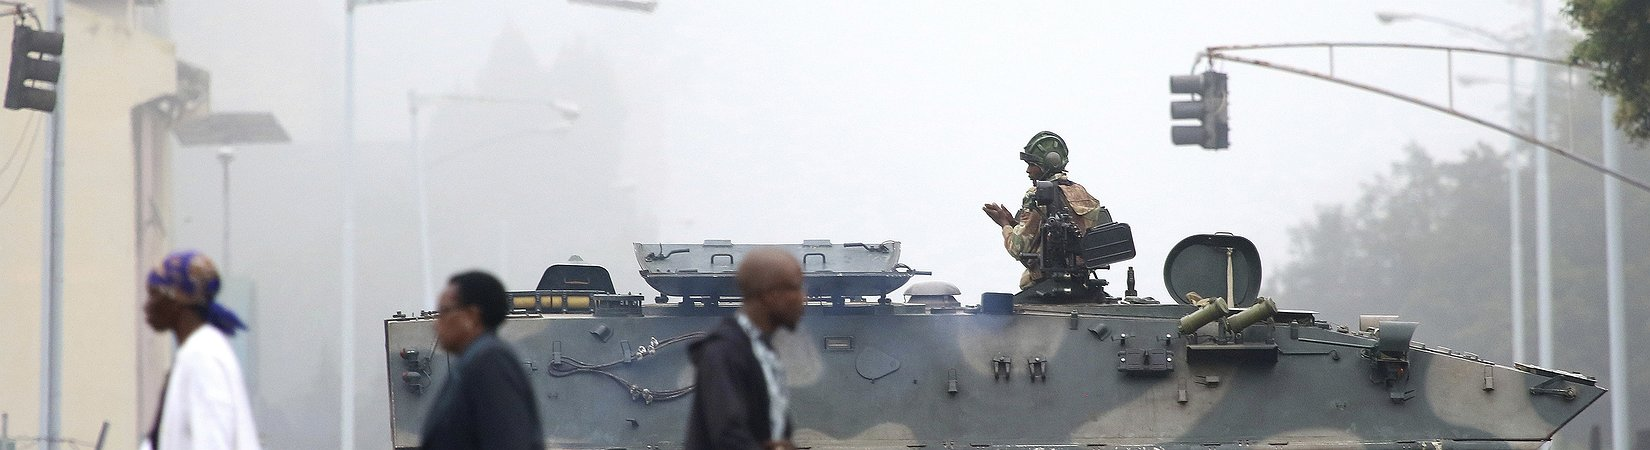 Tensão política se intensifica no Zimbabwe